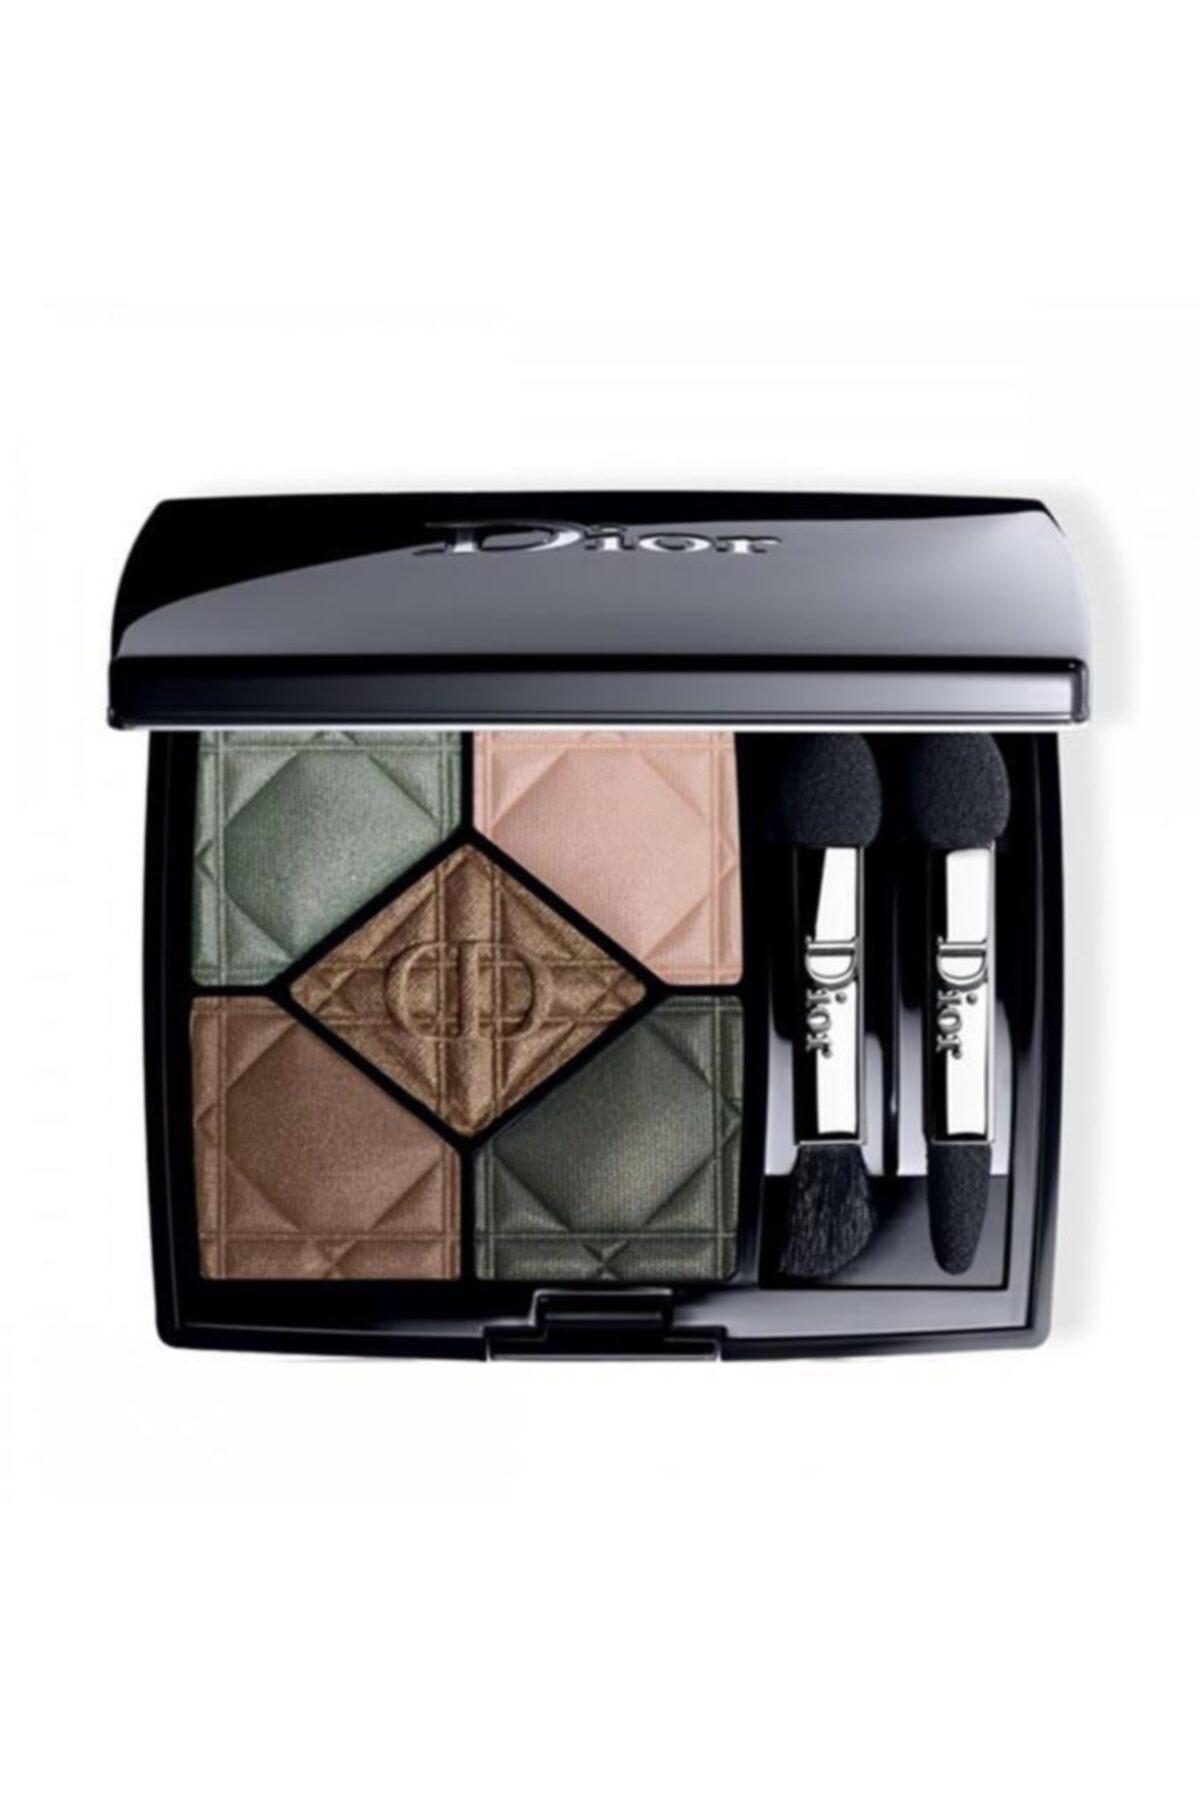 Dior 5 Couleurs Eyeshadow Palette 457 Fascinate Far Paleti 1